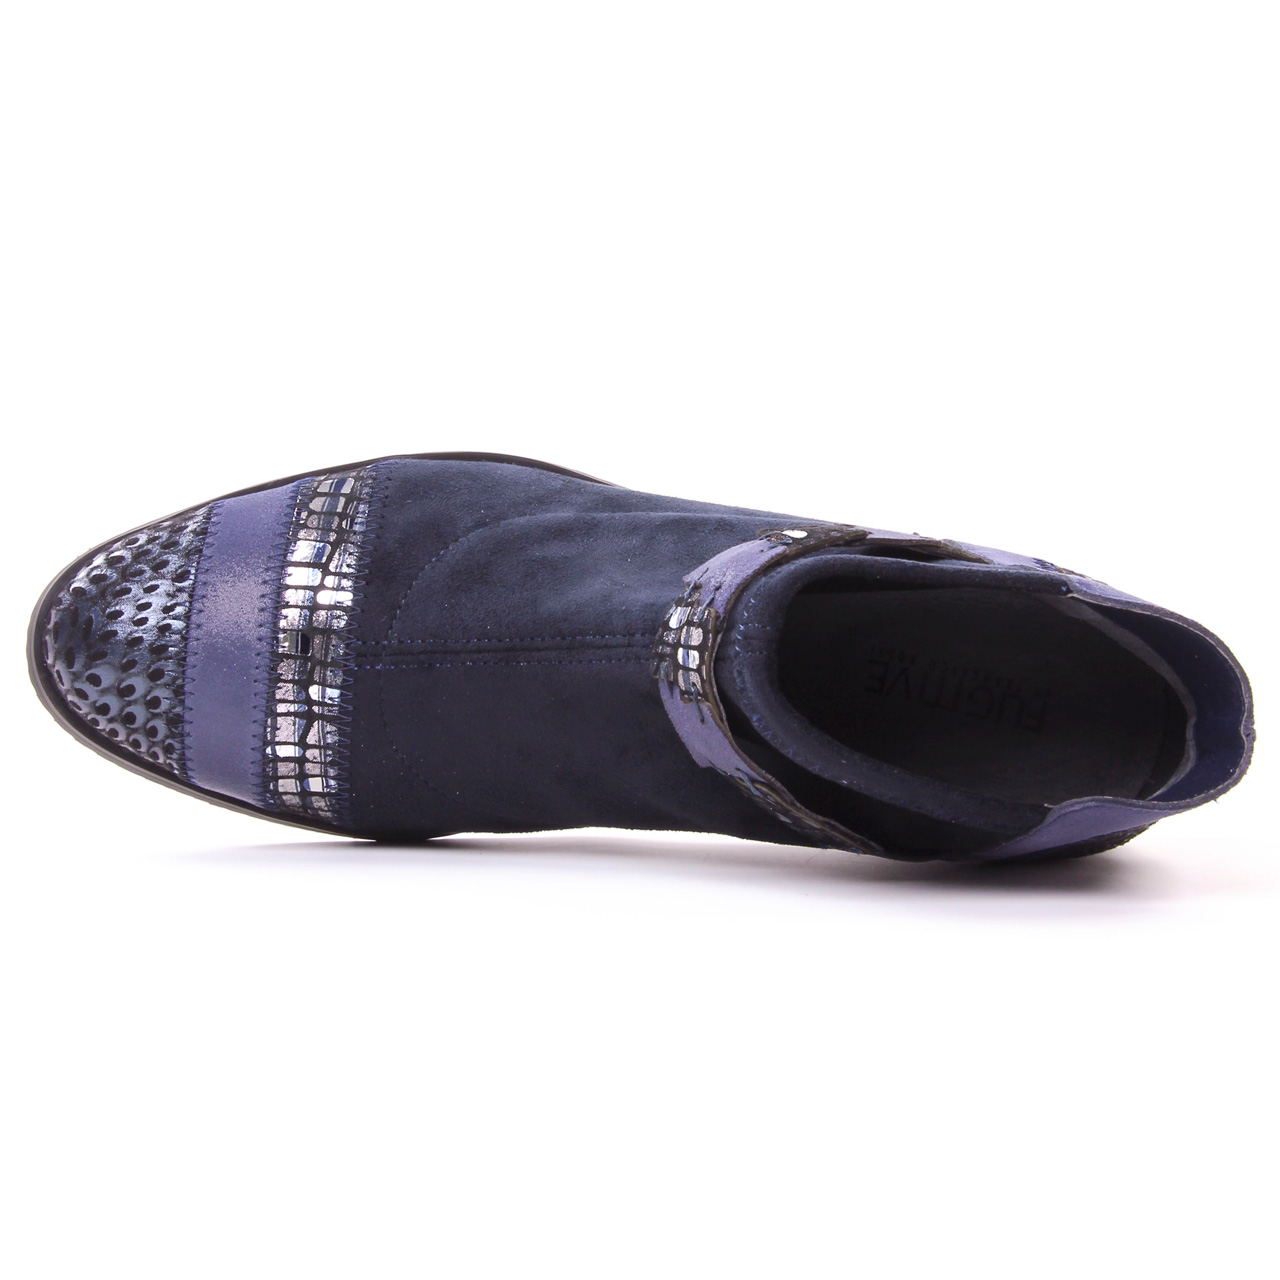 7ea463bece0 boots bleu marine mode femme automne hiver vue 4